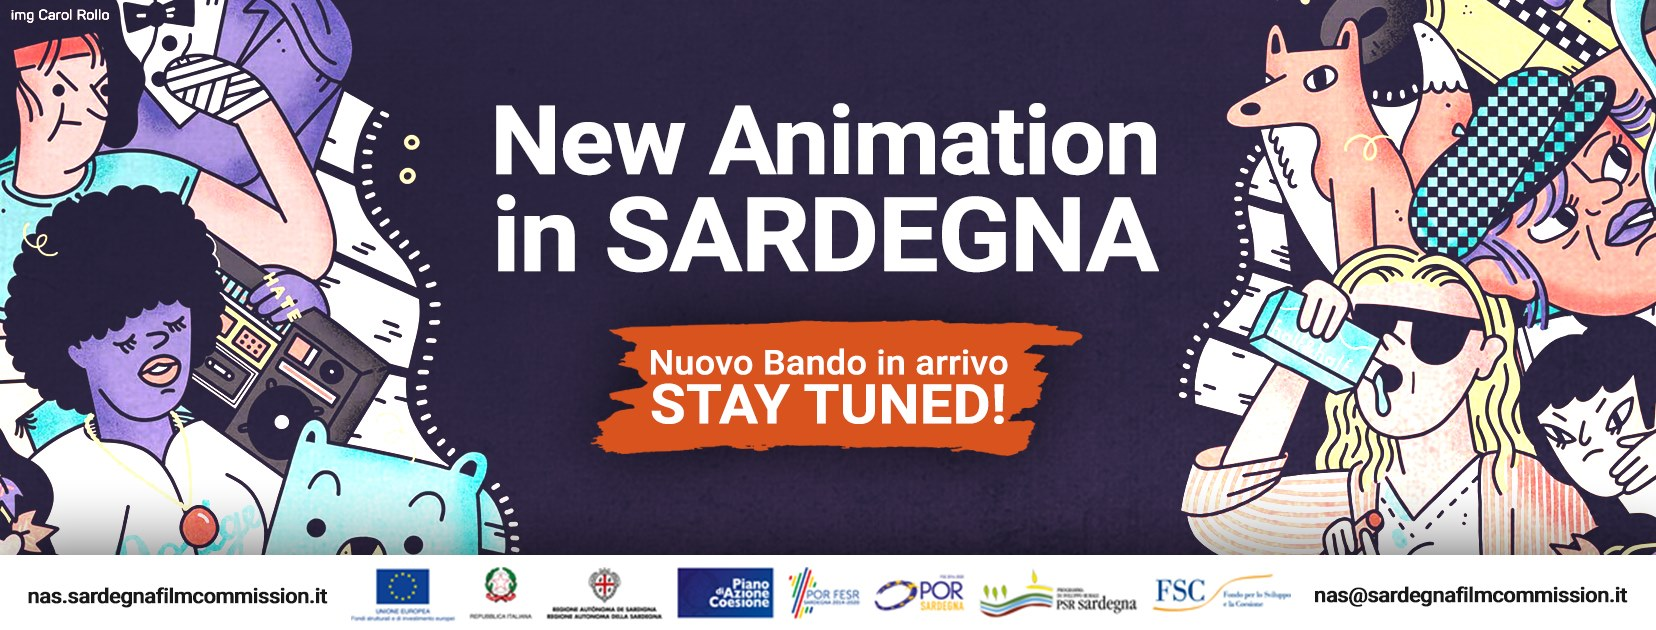 new animation in sardegna film commission